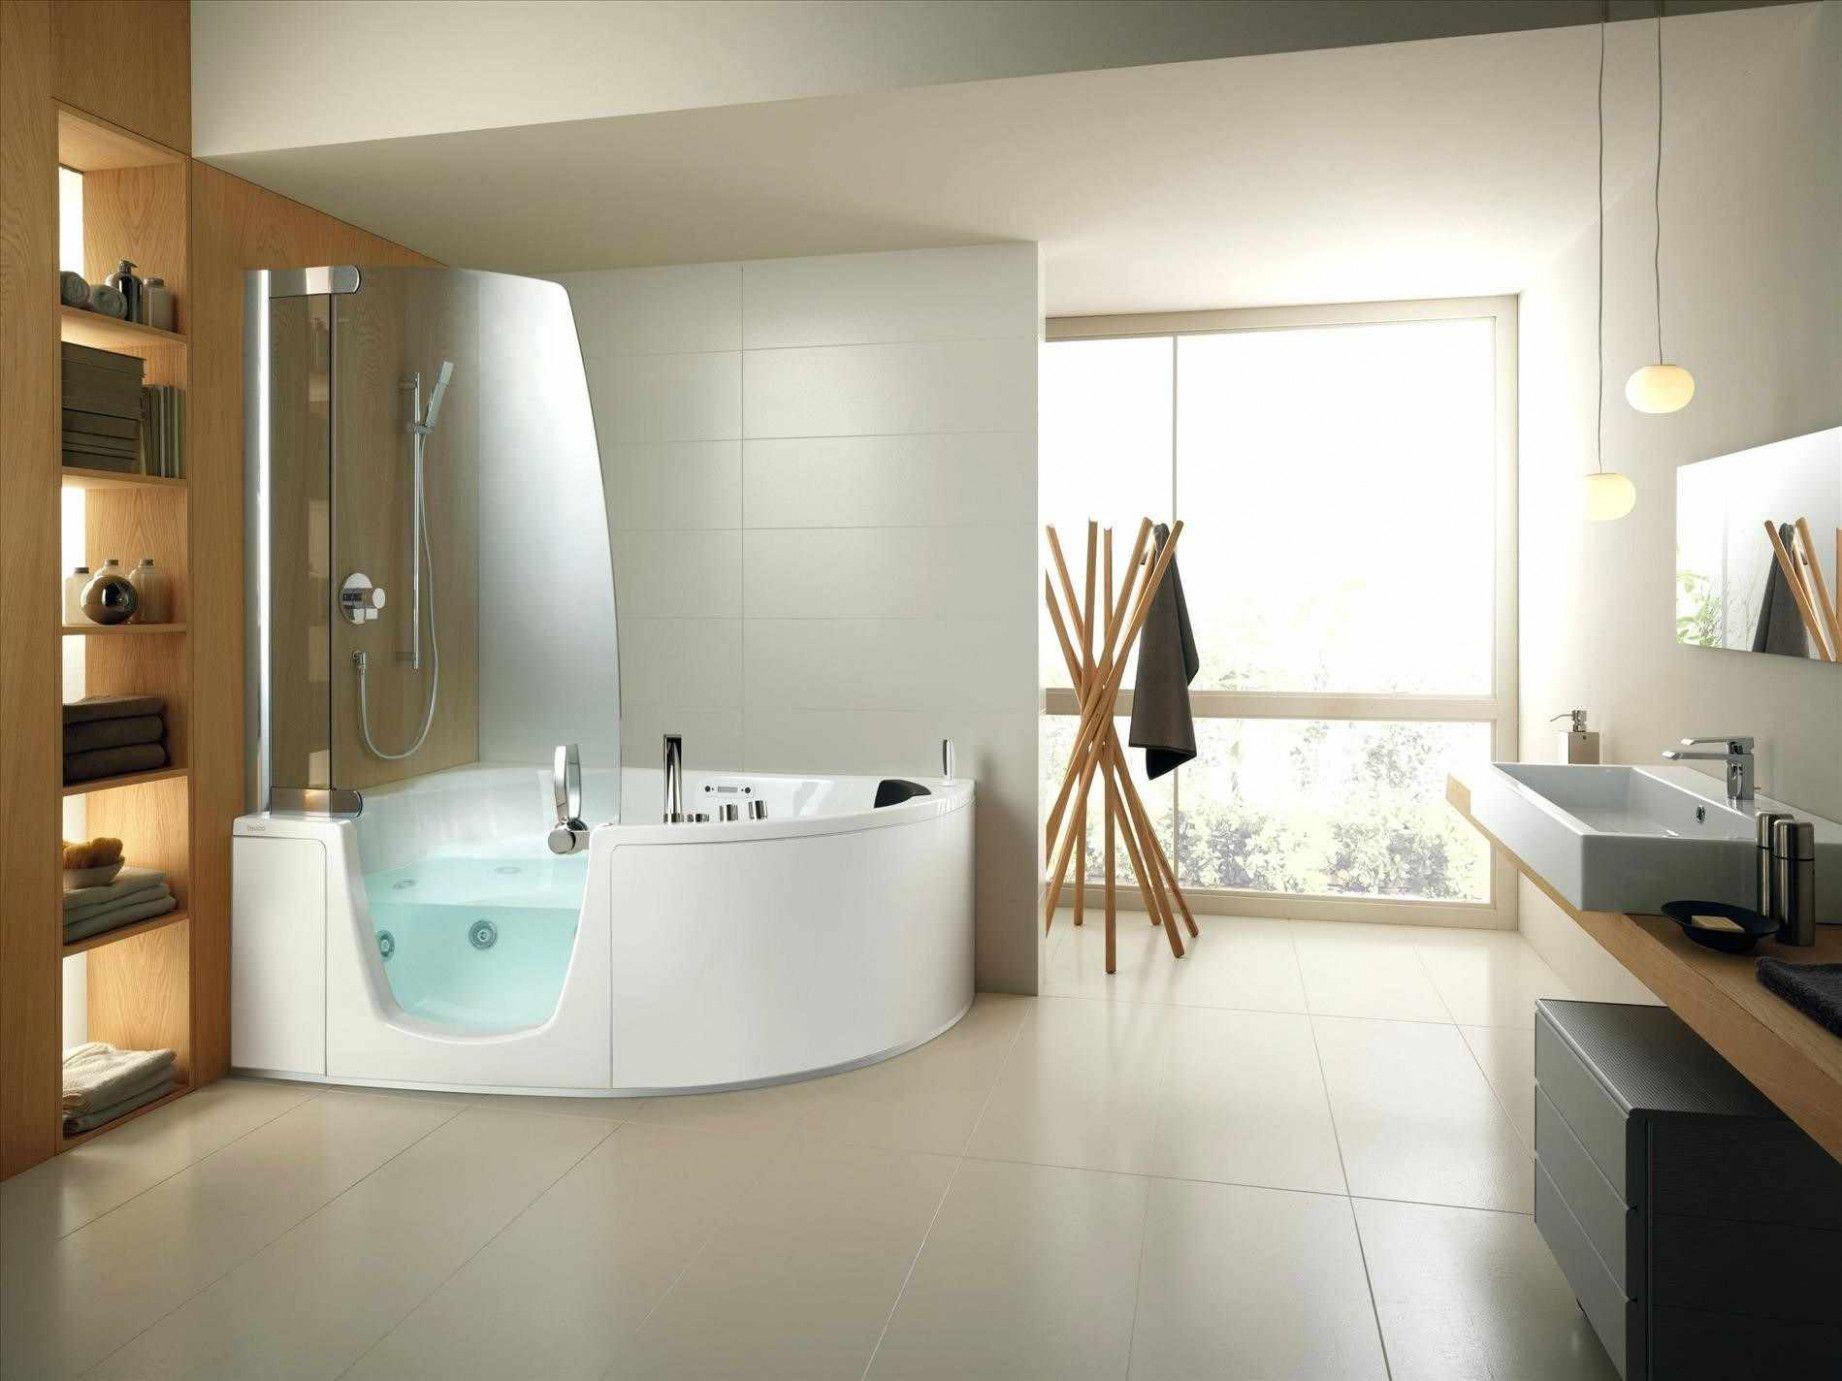 Wheelchair Accessible Bathroom Design cozy-decor   Shower Design For ...